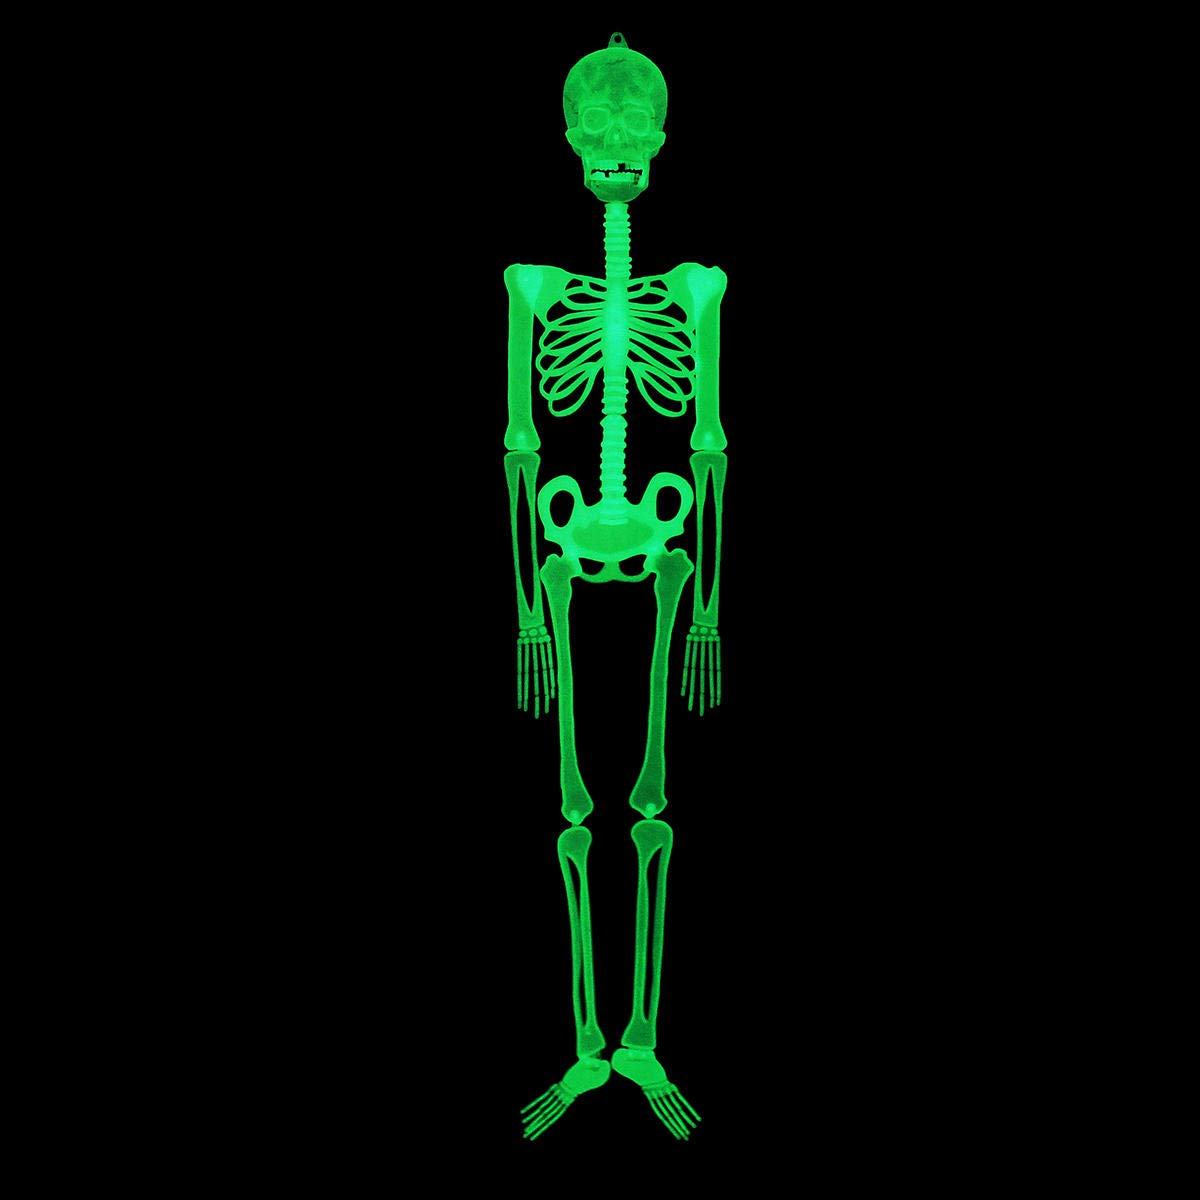 Halloween Luminou Human Skeleton Decoration Classroom Occasionally Adjustable - 1PCs by Unknown (Image #4)